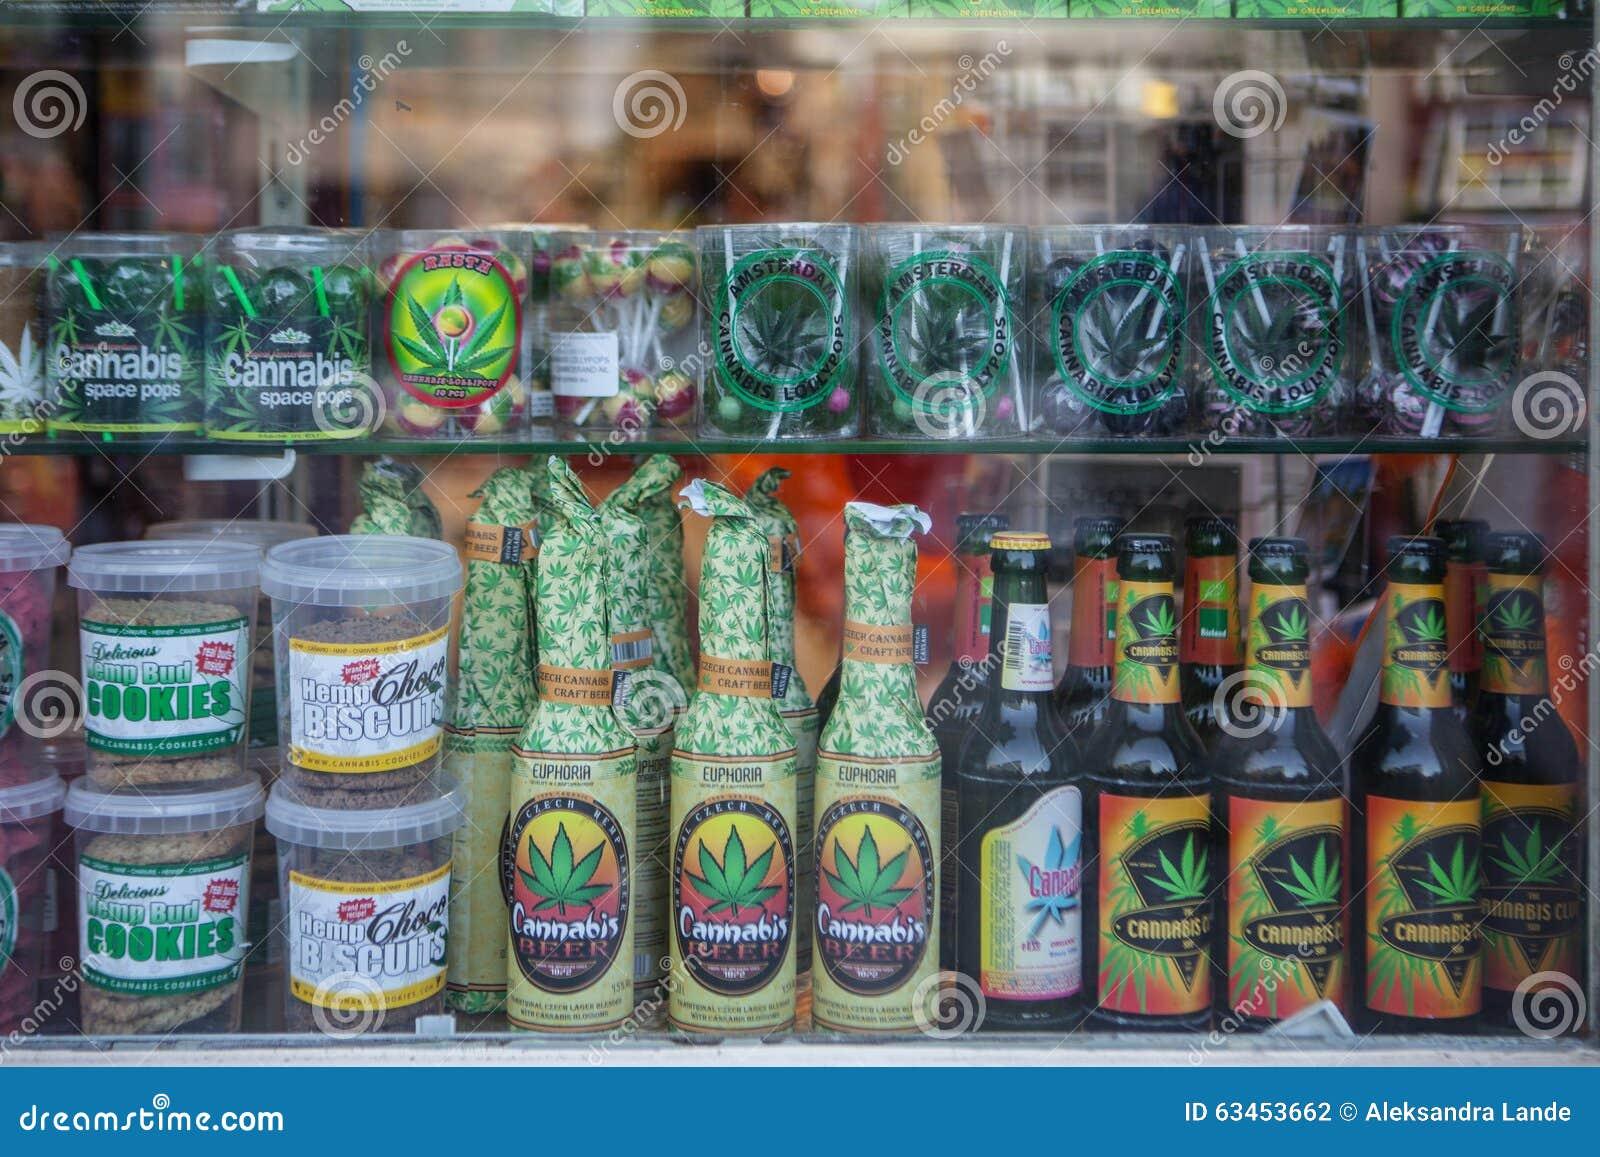 Amsterdam weed online shop